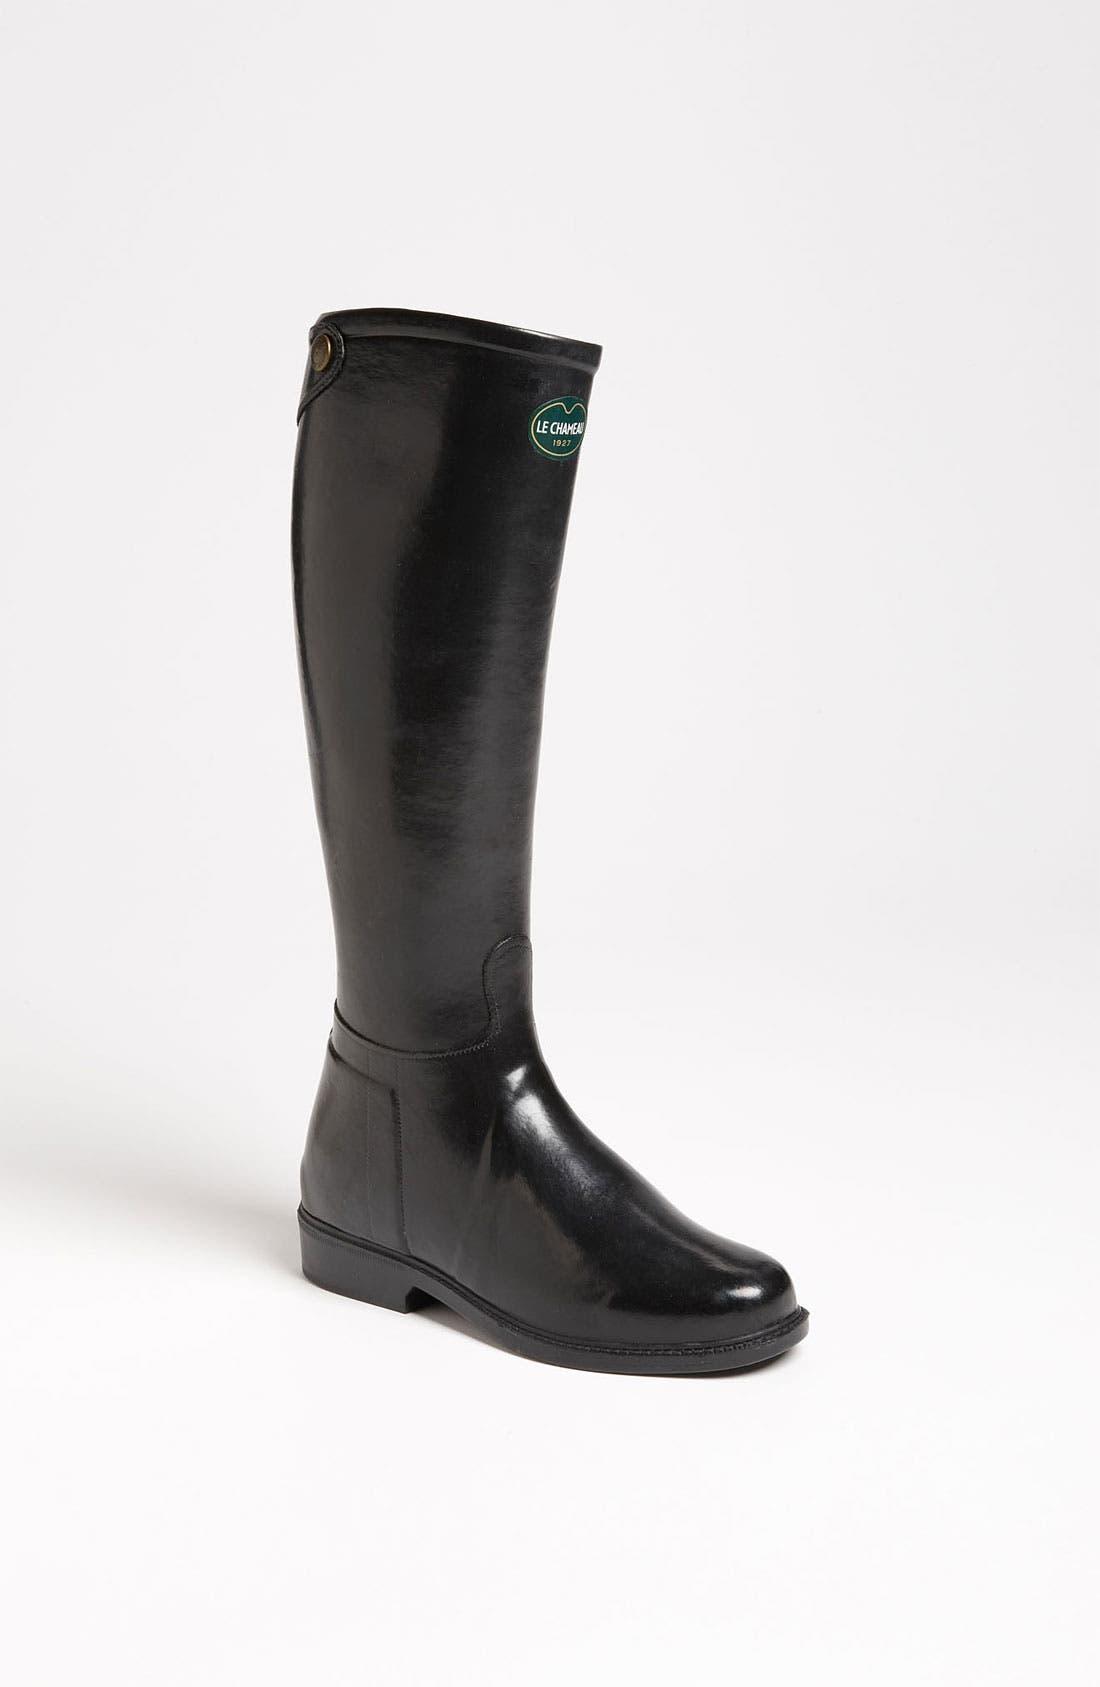 Main Image - Le Chameau 'Cavaliere' Rain Boot (Women)